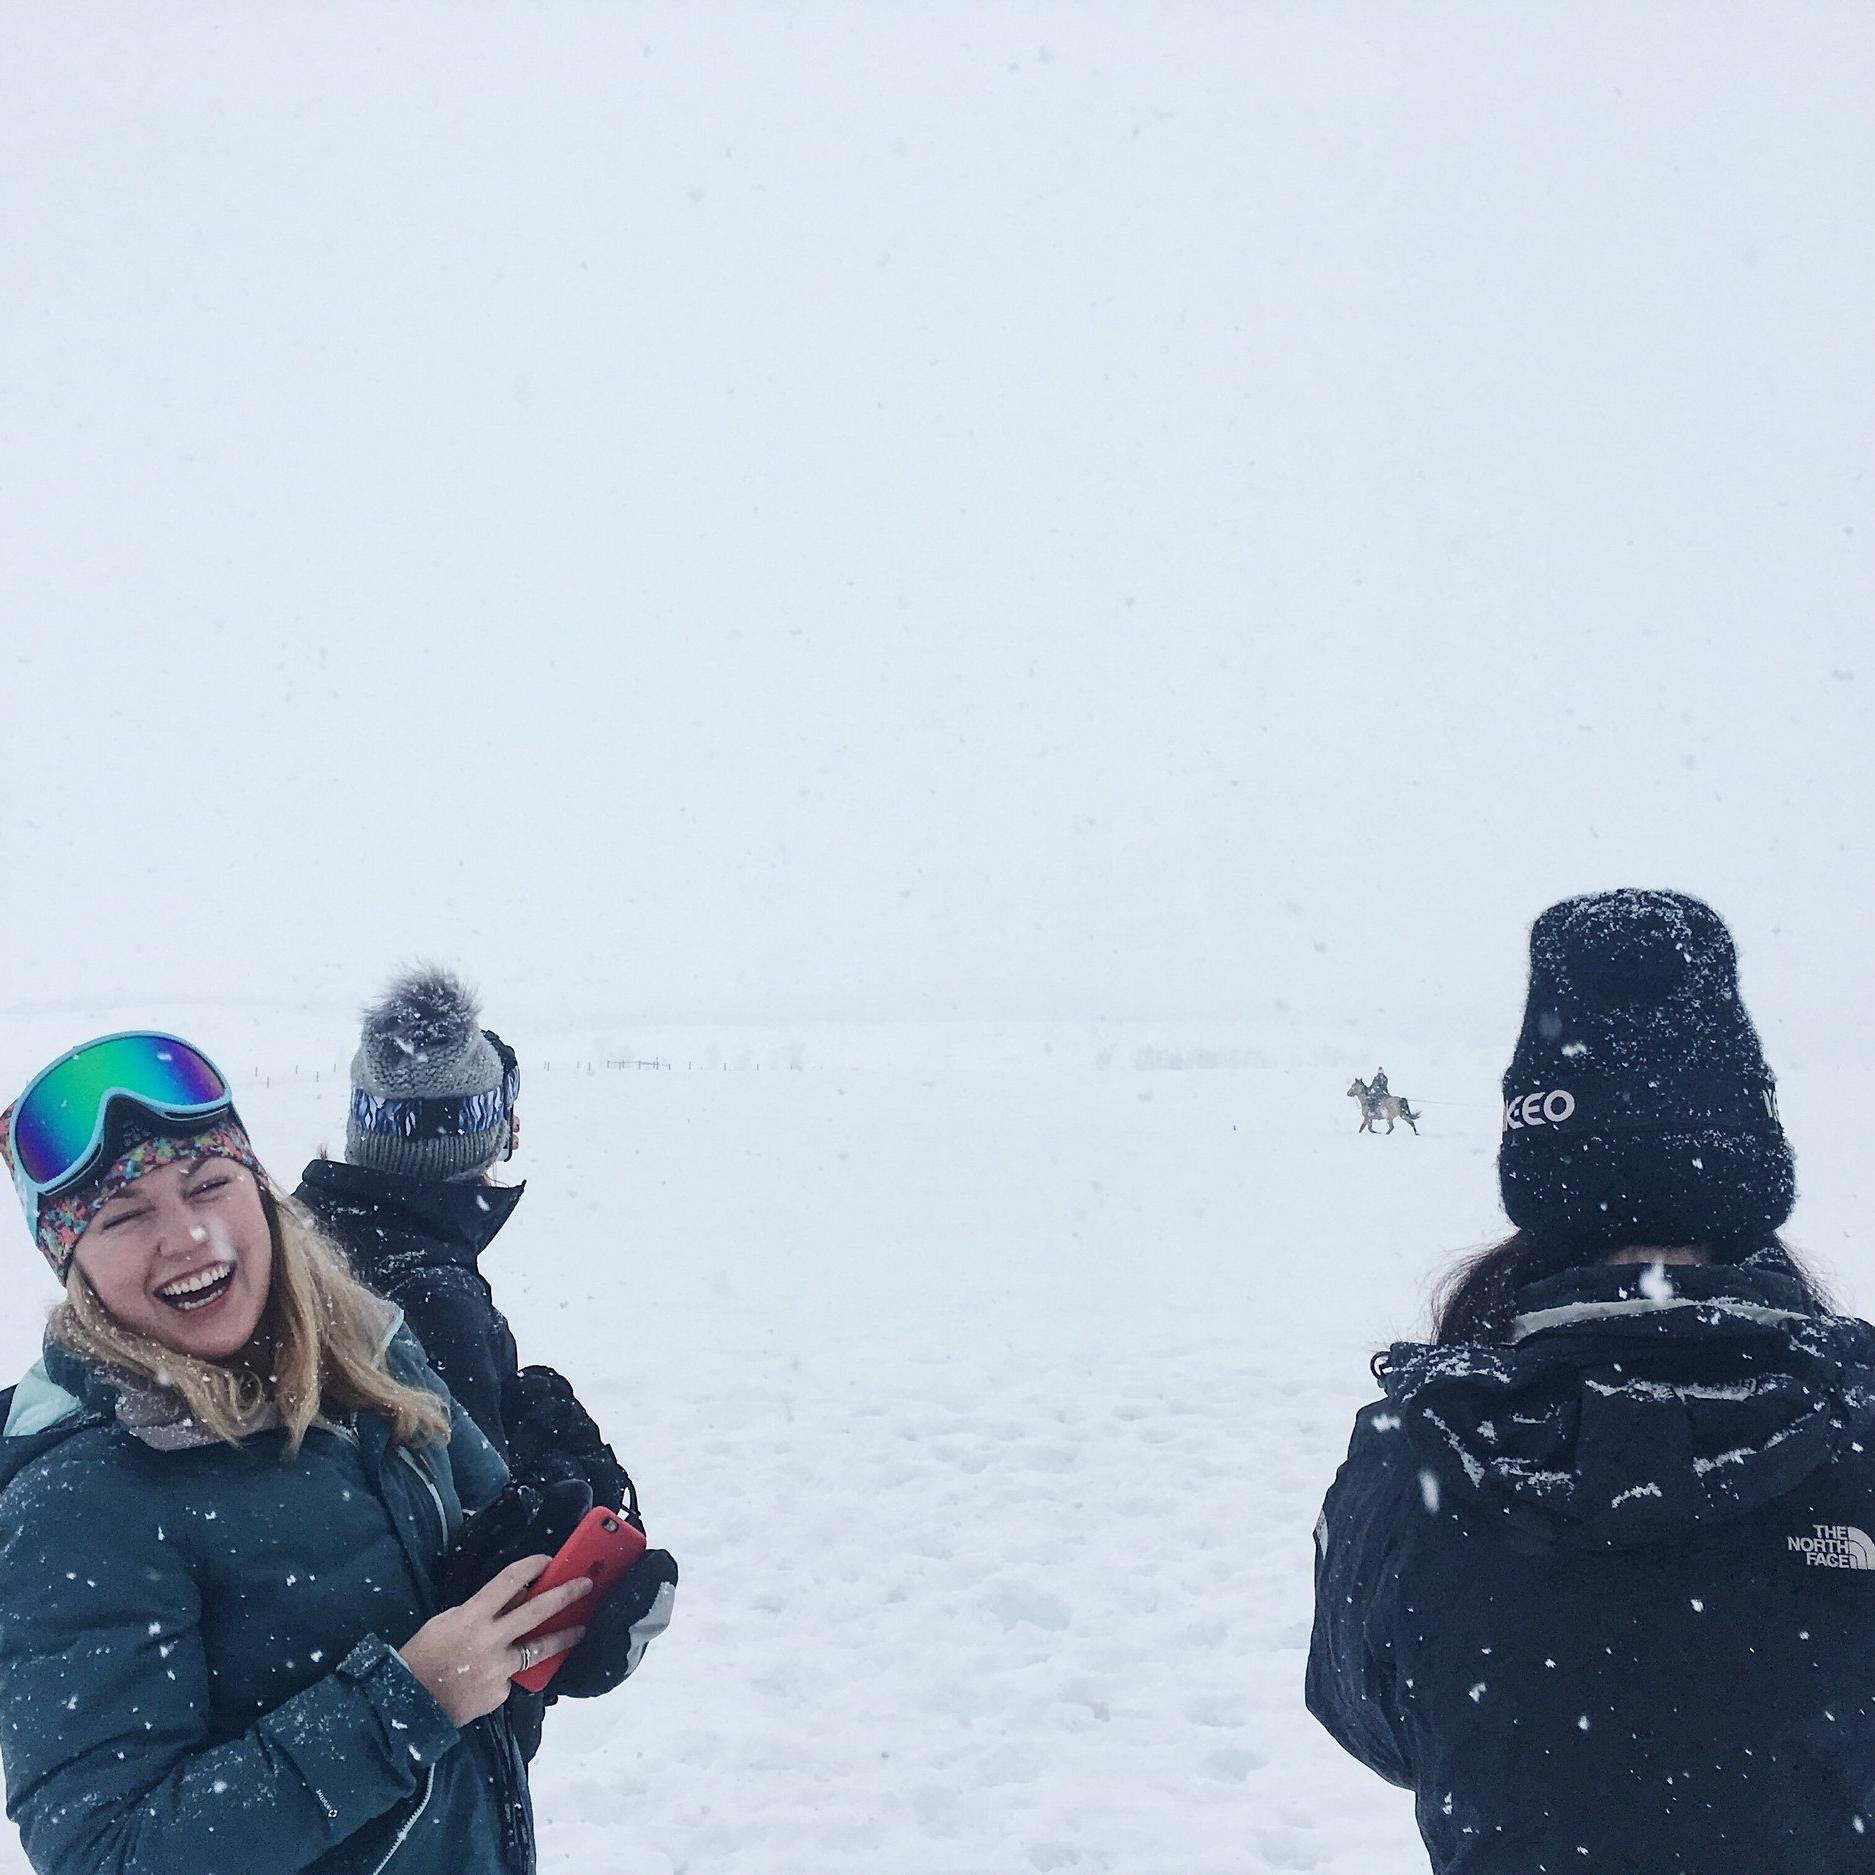 A real-life Winter Wonderland.